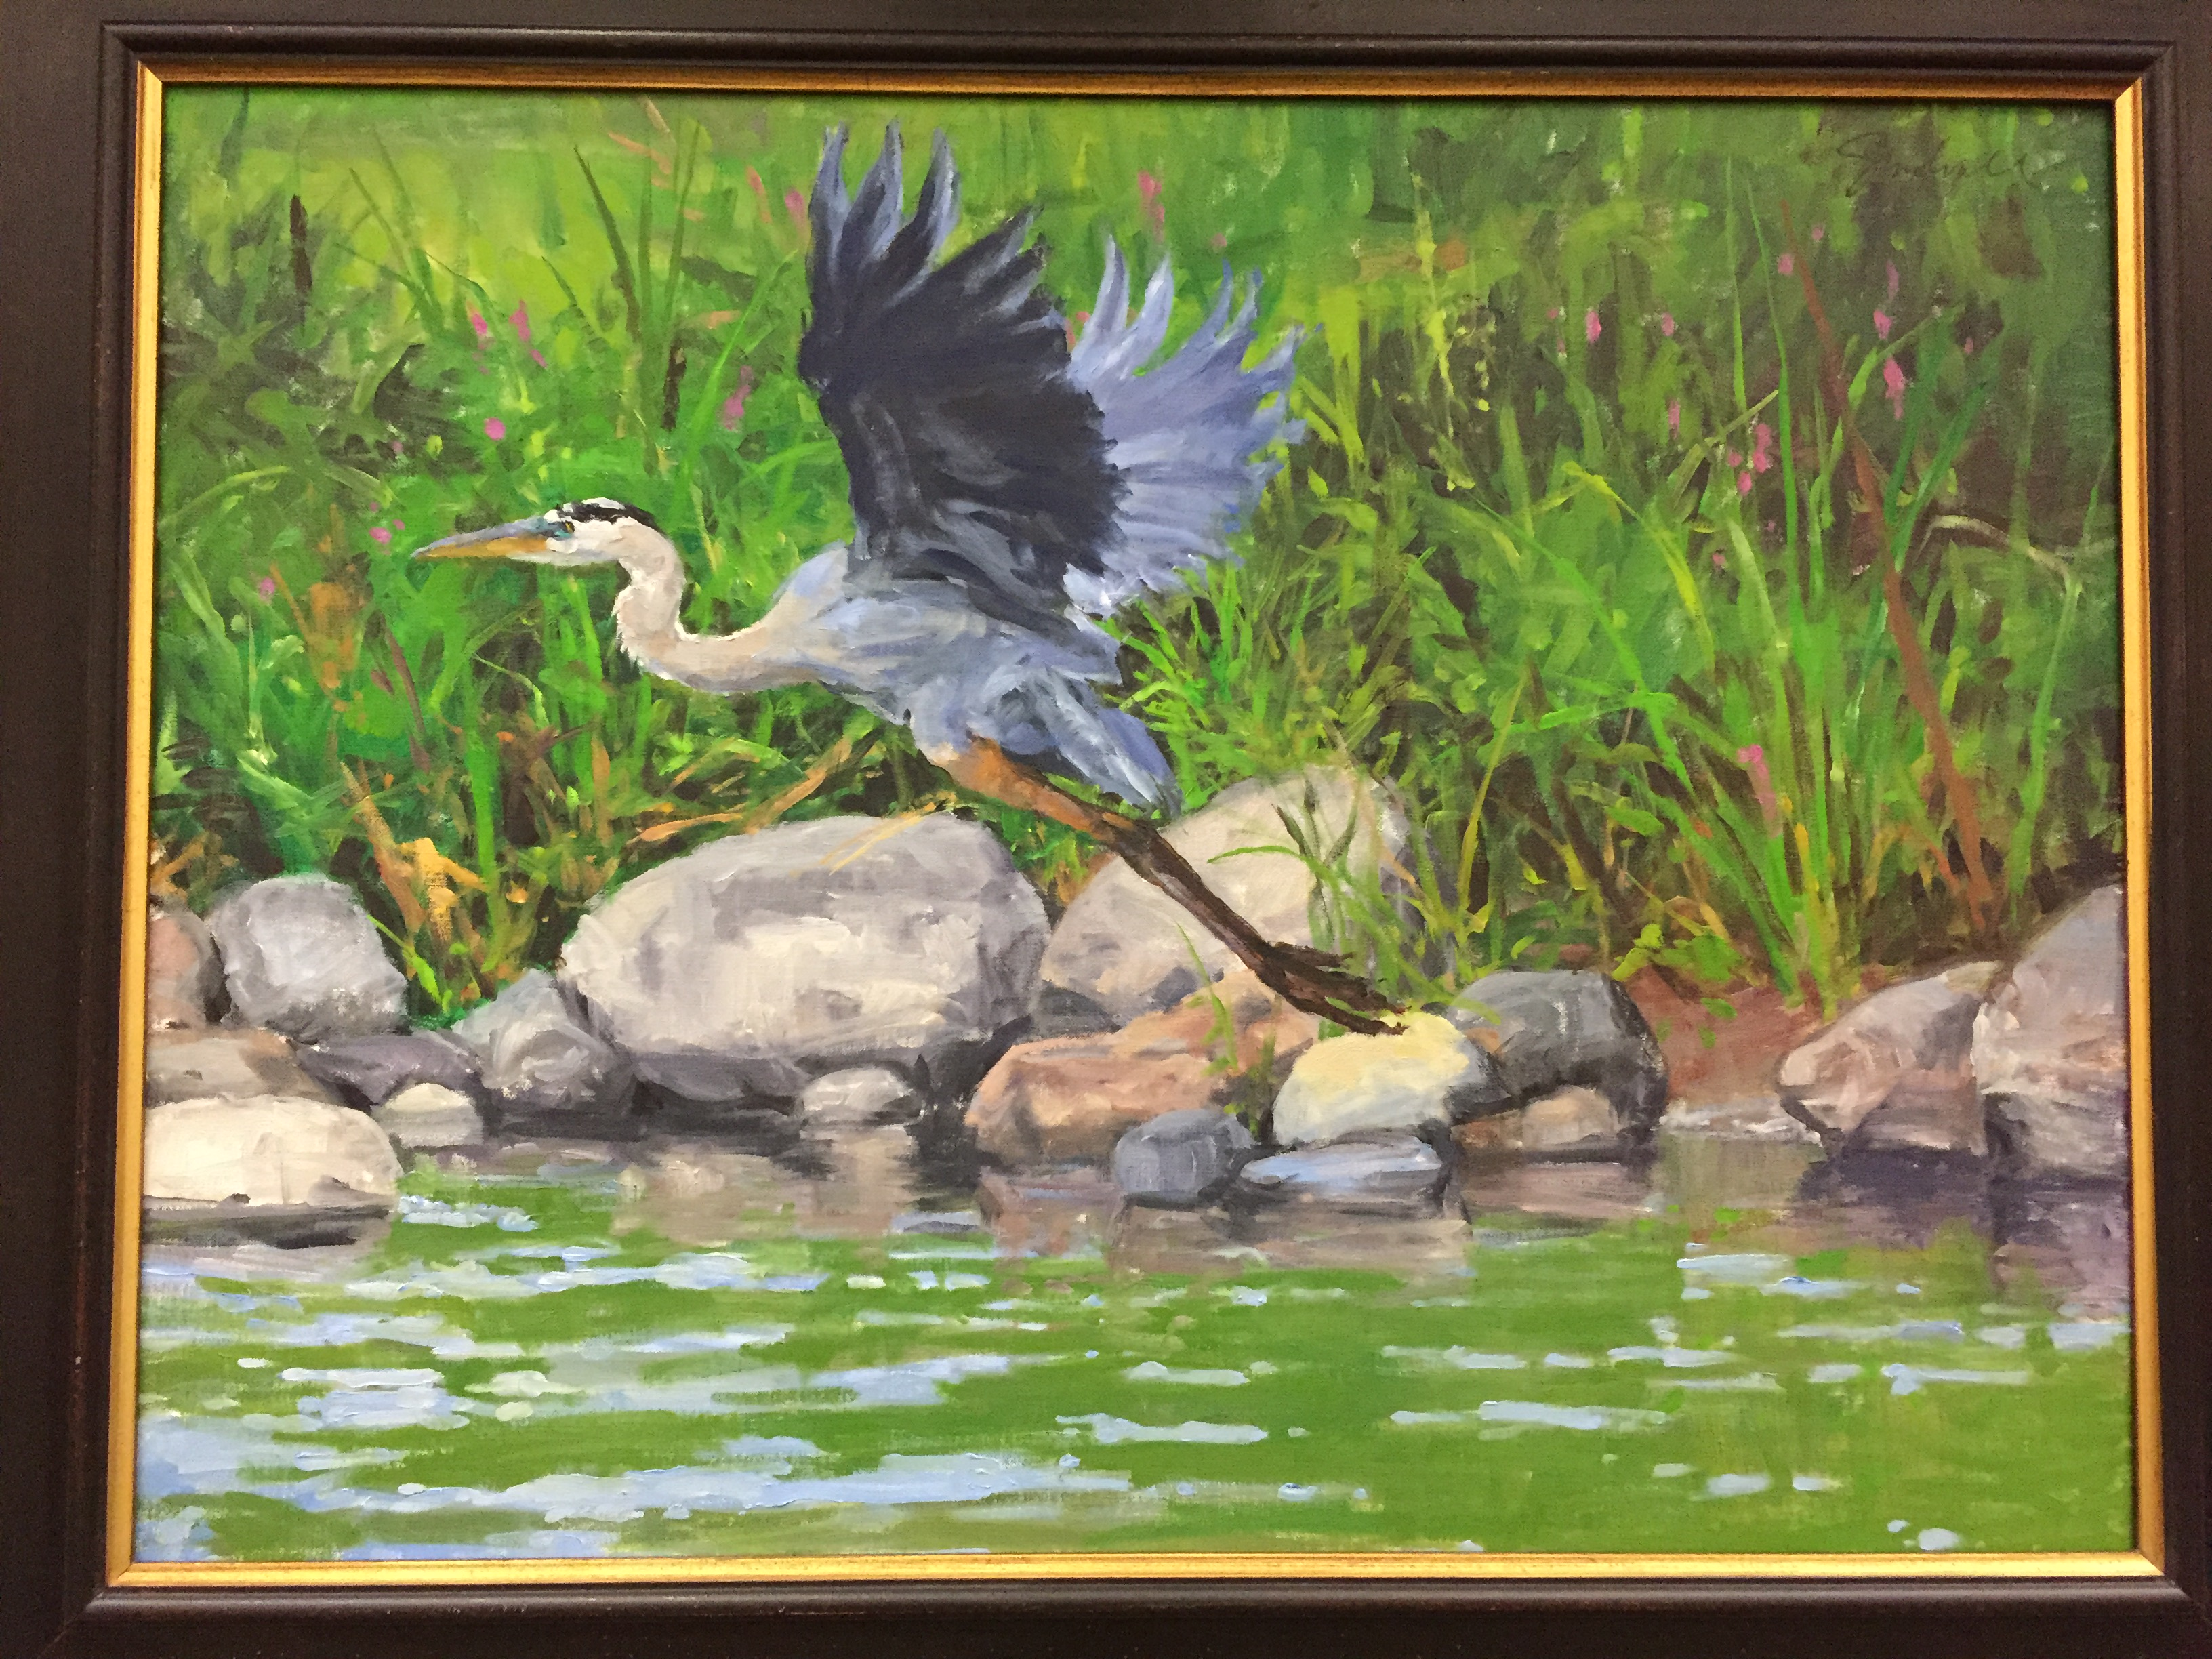 Bird Paintings Are 'Low Hanging Fruit' for Painter Joseph Sundwall